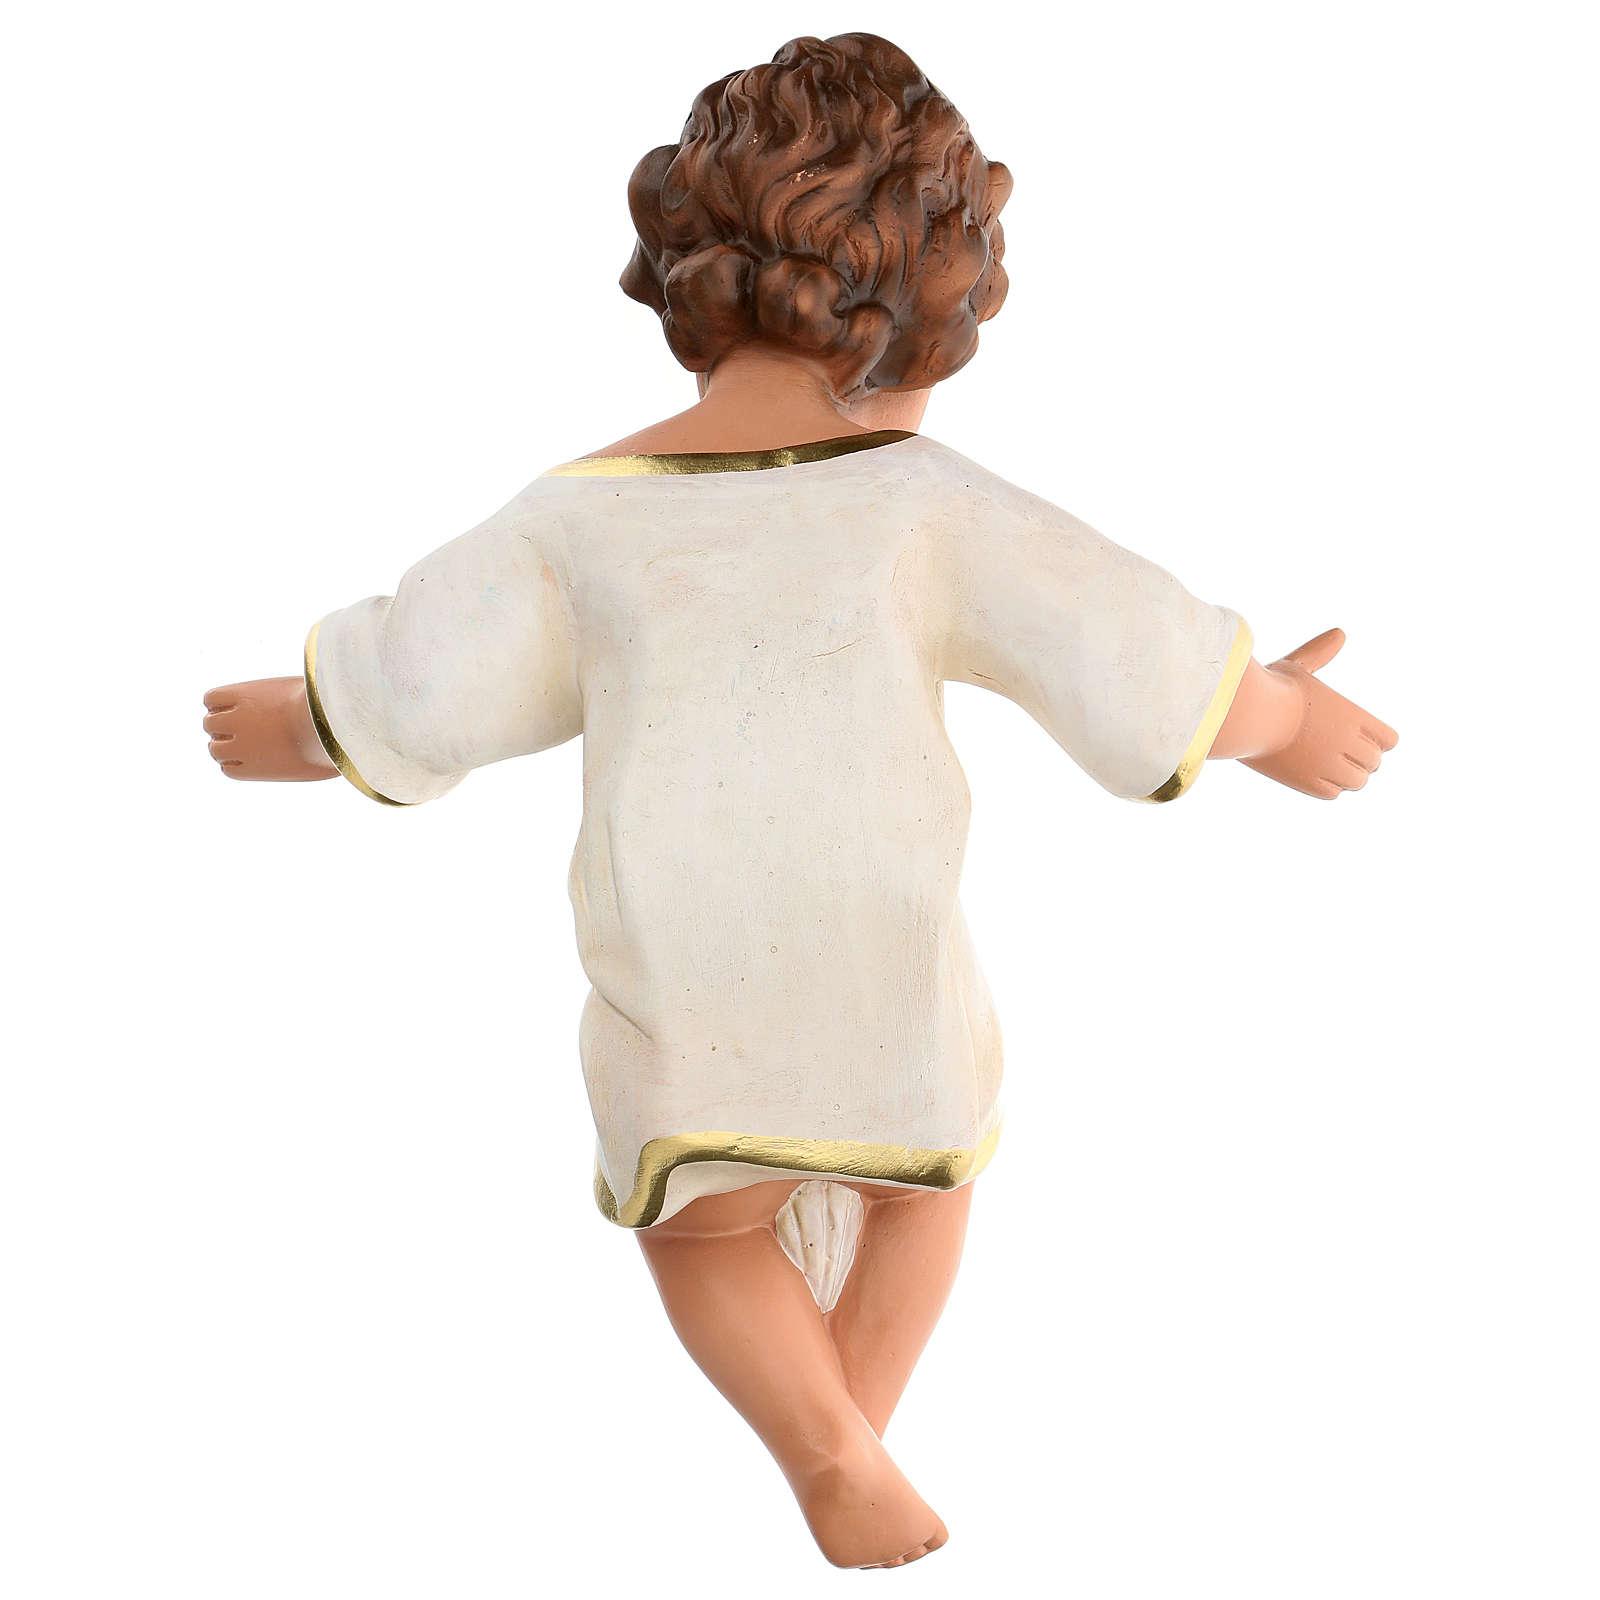 Gesù Bambino 36 cm per presepe Arte Barsanti di 80 cm 4